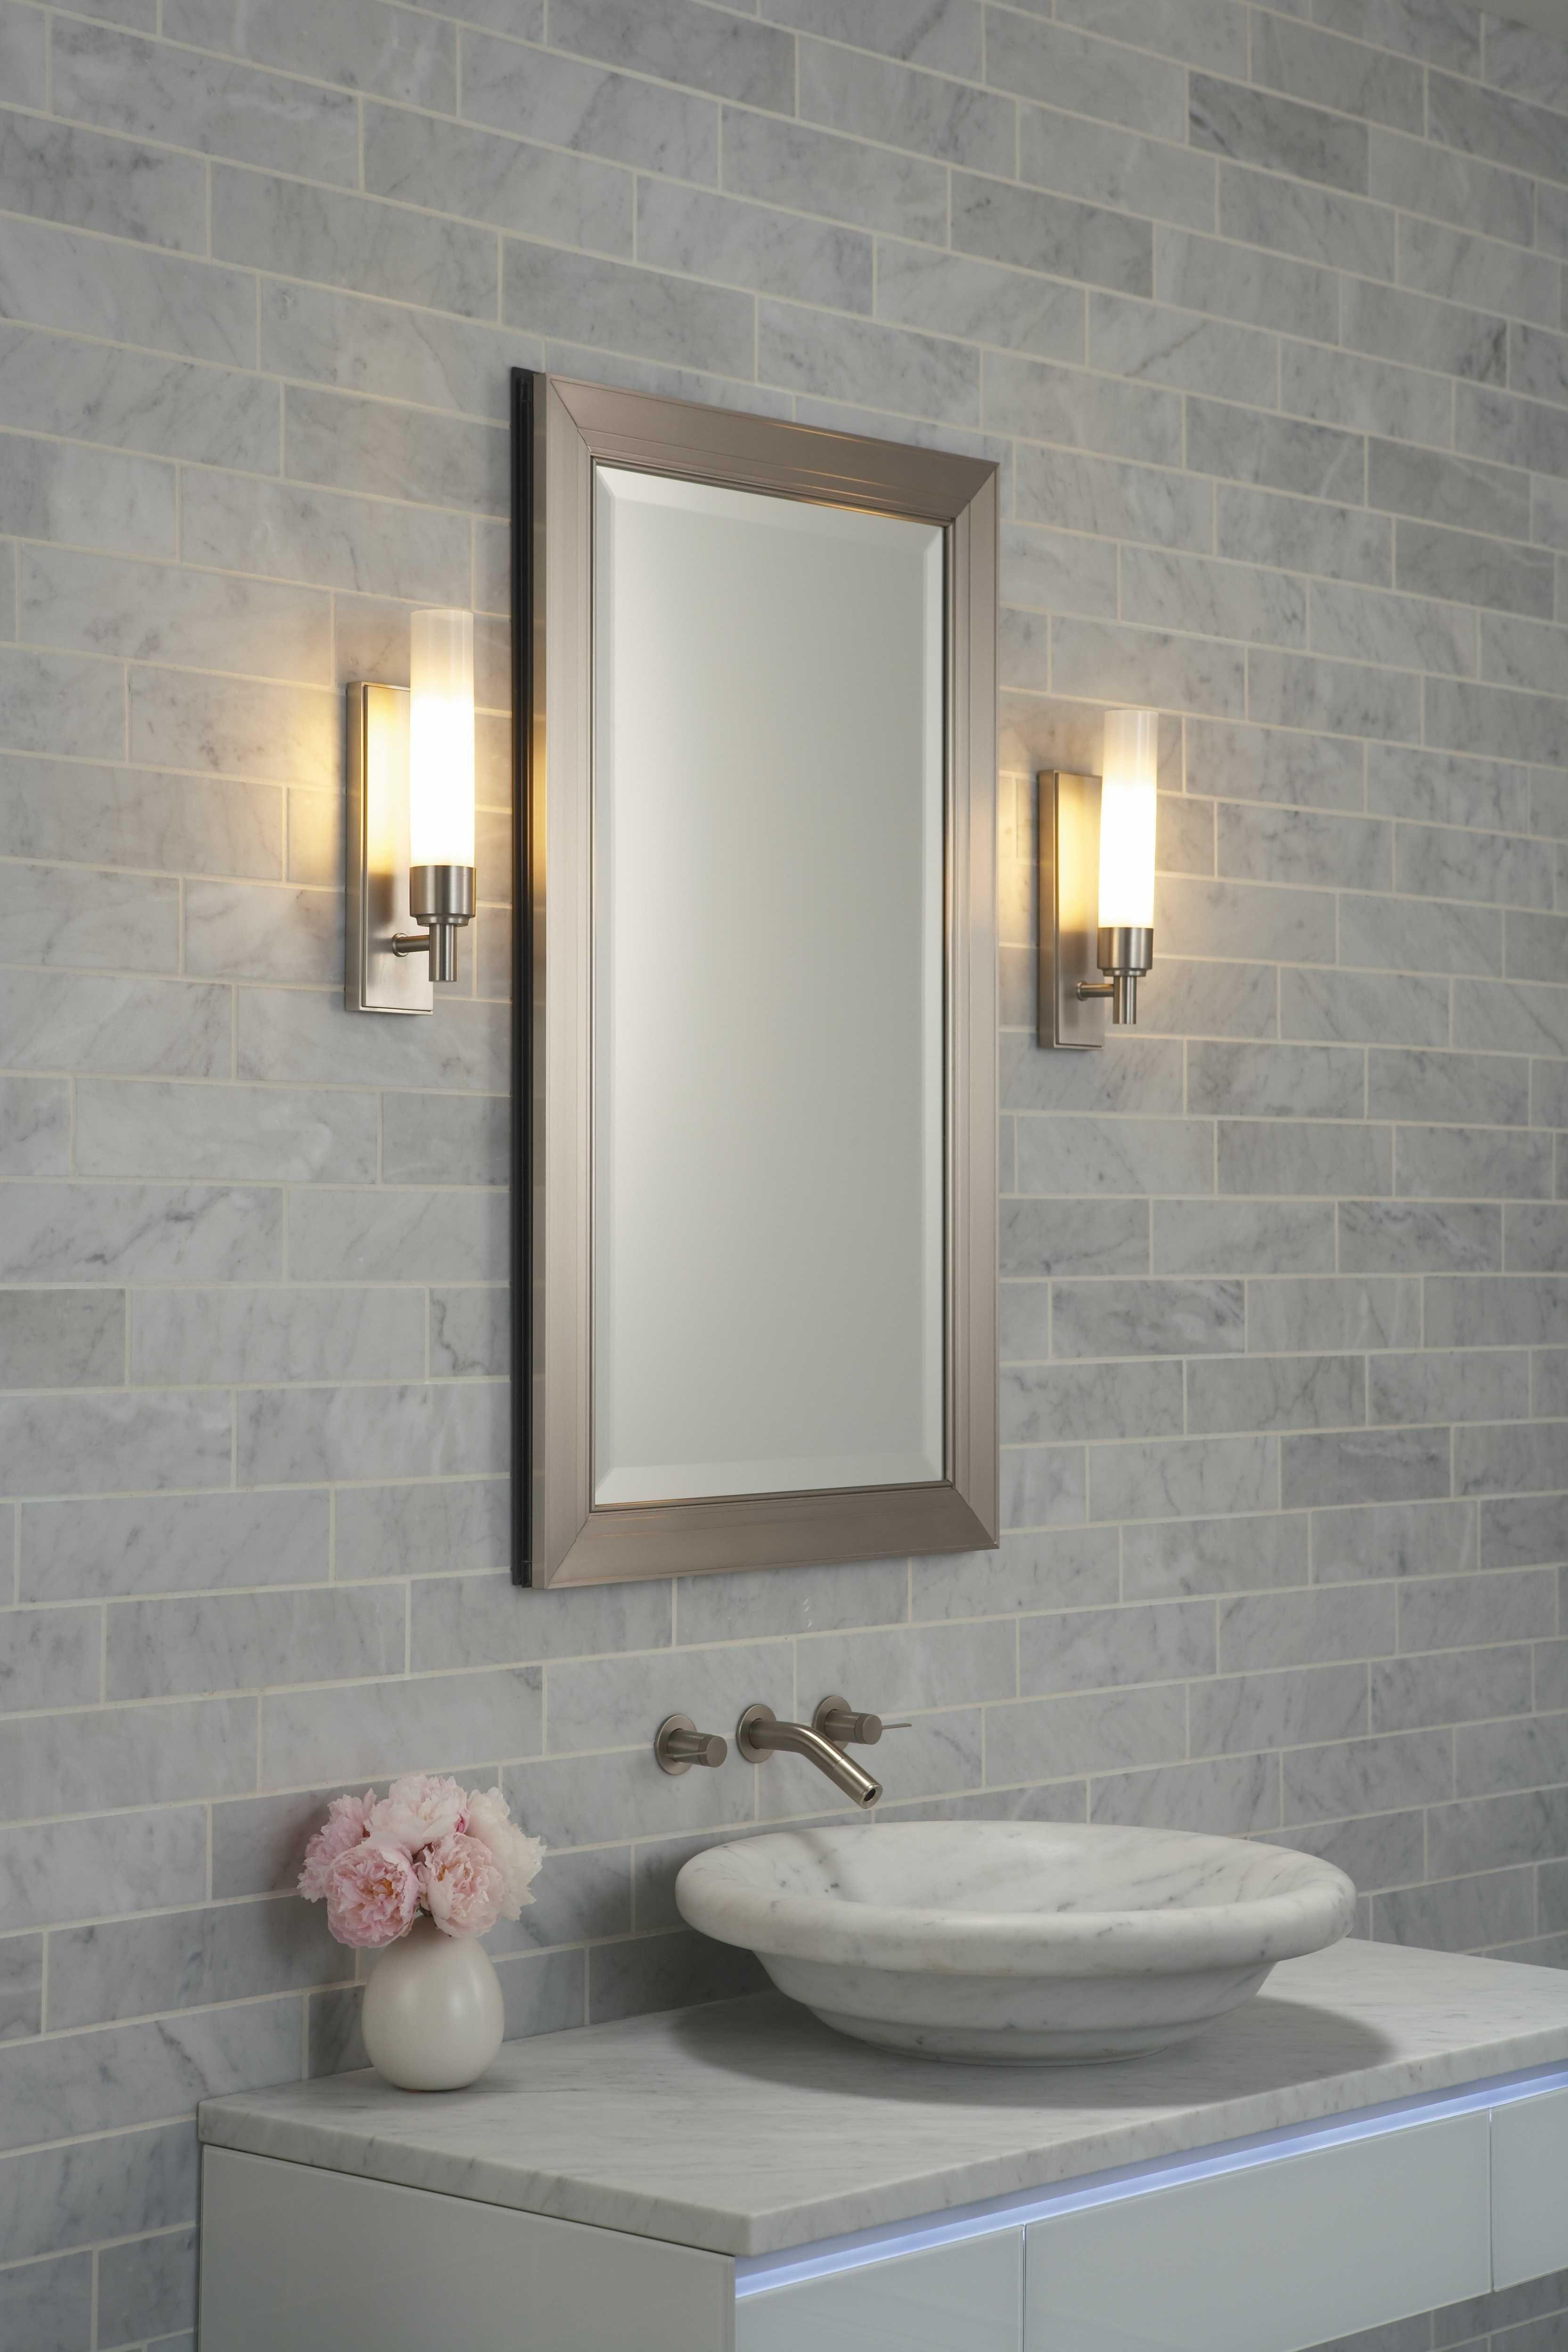 24 Luxury Vanity Mirror With Lights Ideas Bathroom Wall Sconces